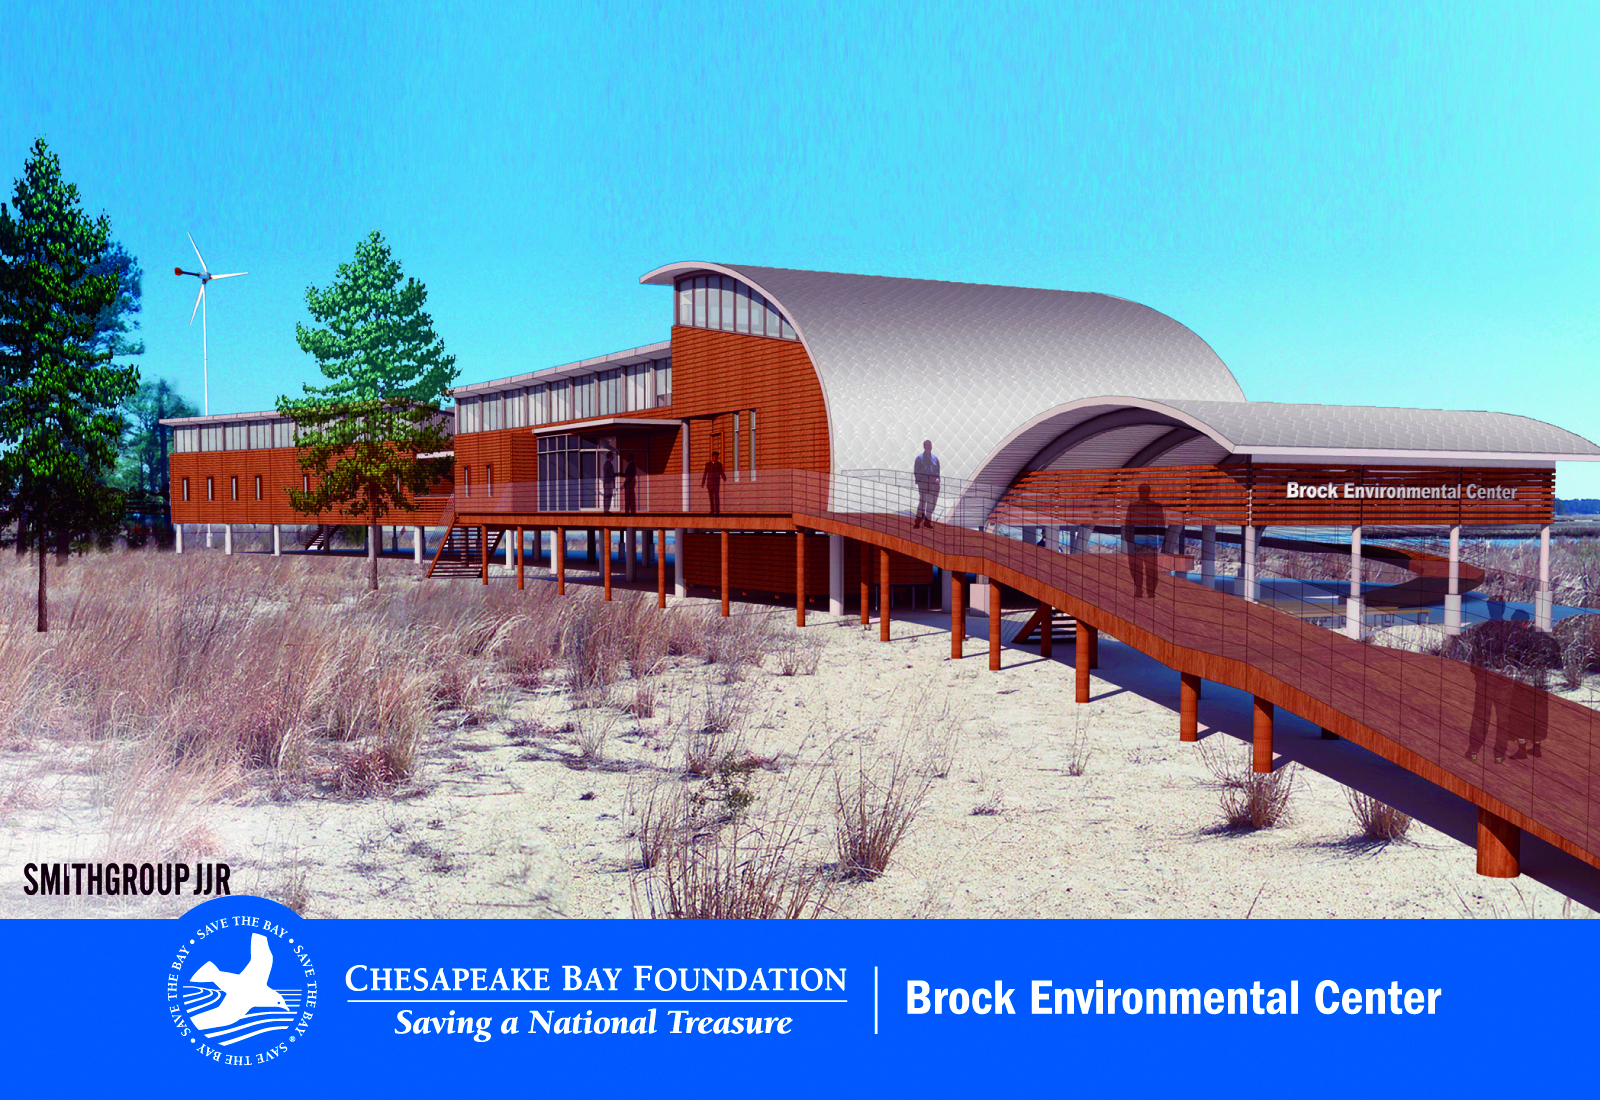 education center designed be greenest virginia 0 - Chesapeake Bay Beach House Rentals, Beach House - Chesapeake Bay Beach House Rentals, Beach House Www.petbs.net